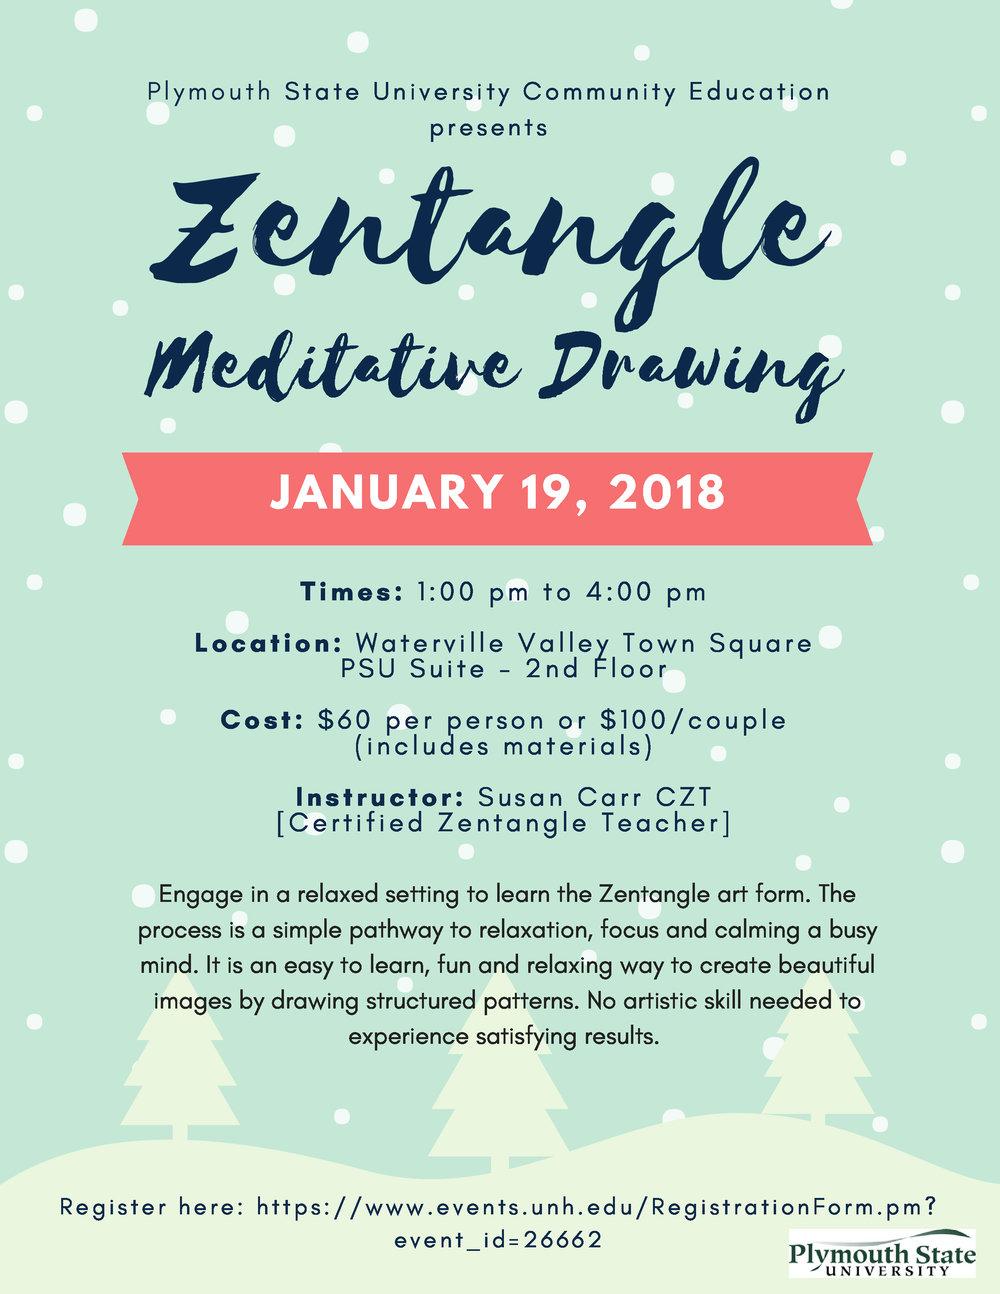 Zentangle Meditative Drawing Flyer.jpg